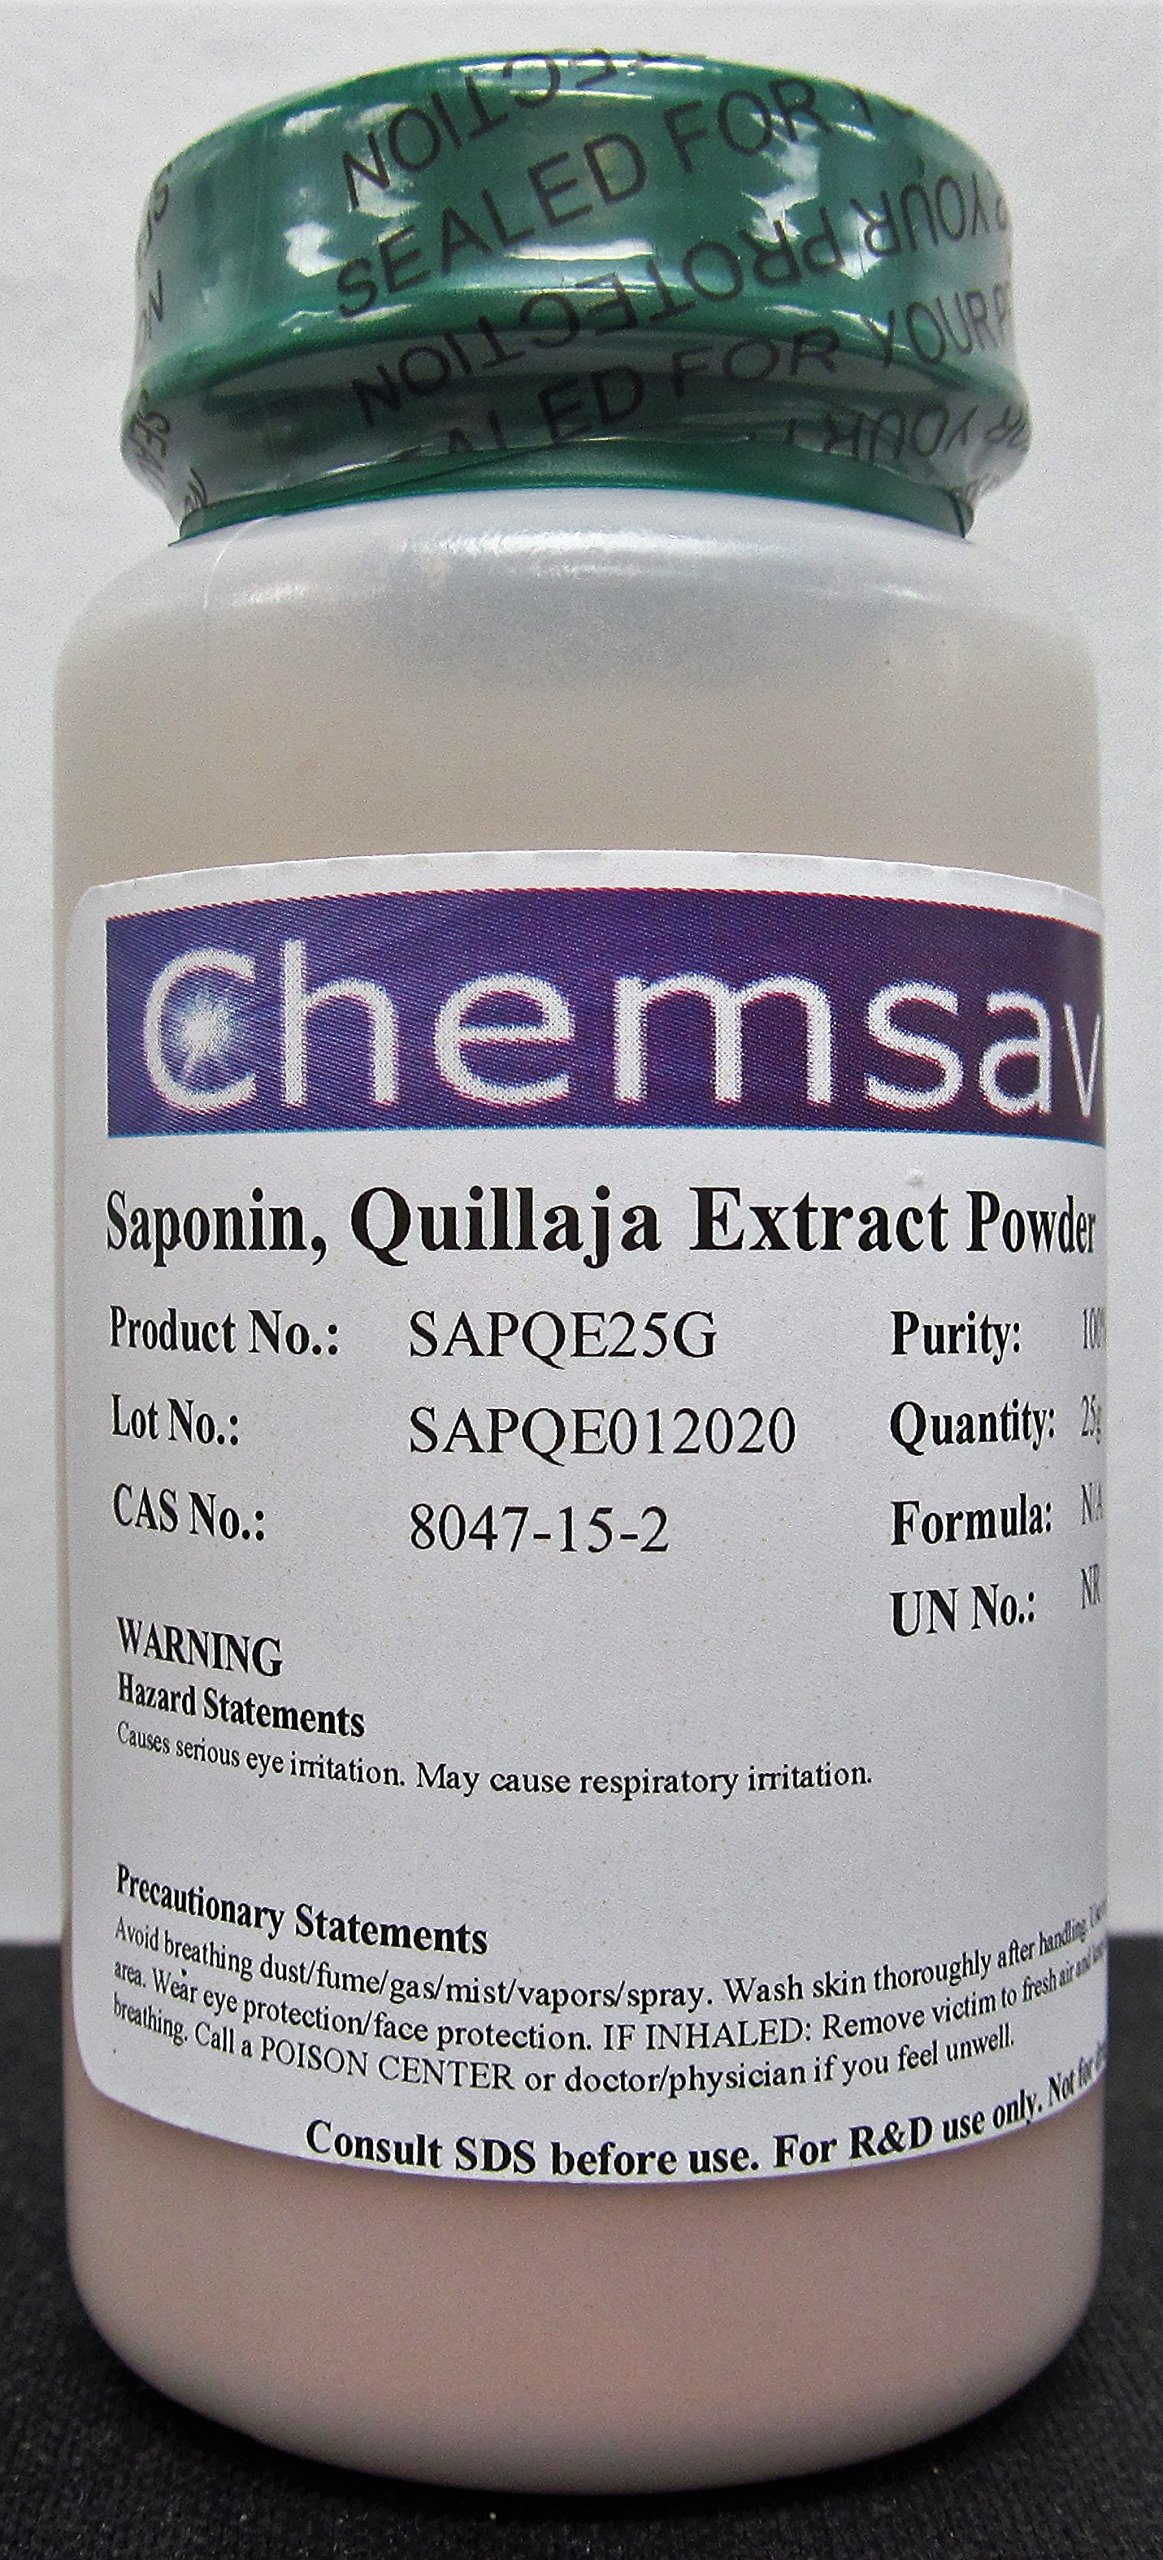 Saponin, Quillaja Extract Powder, 100%, 25g